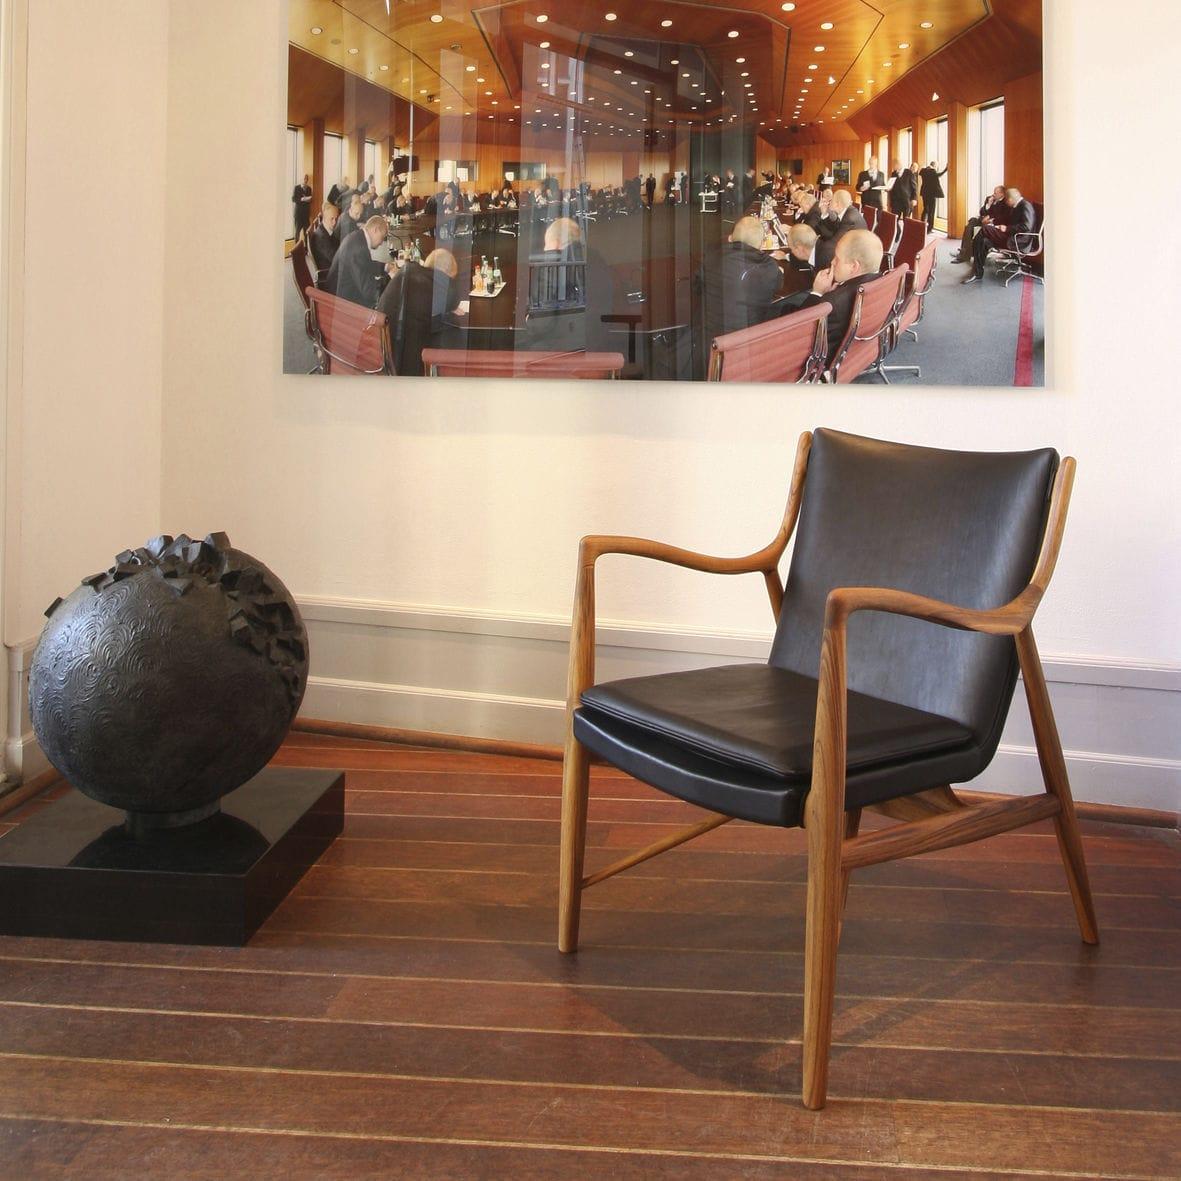 Fauteuil design scandinave en bois en tissu en cuir 45